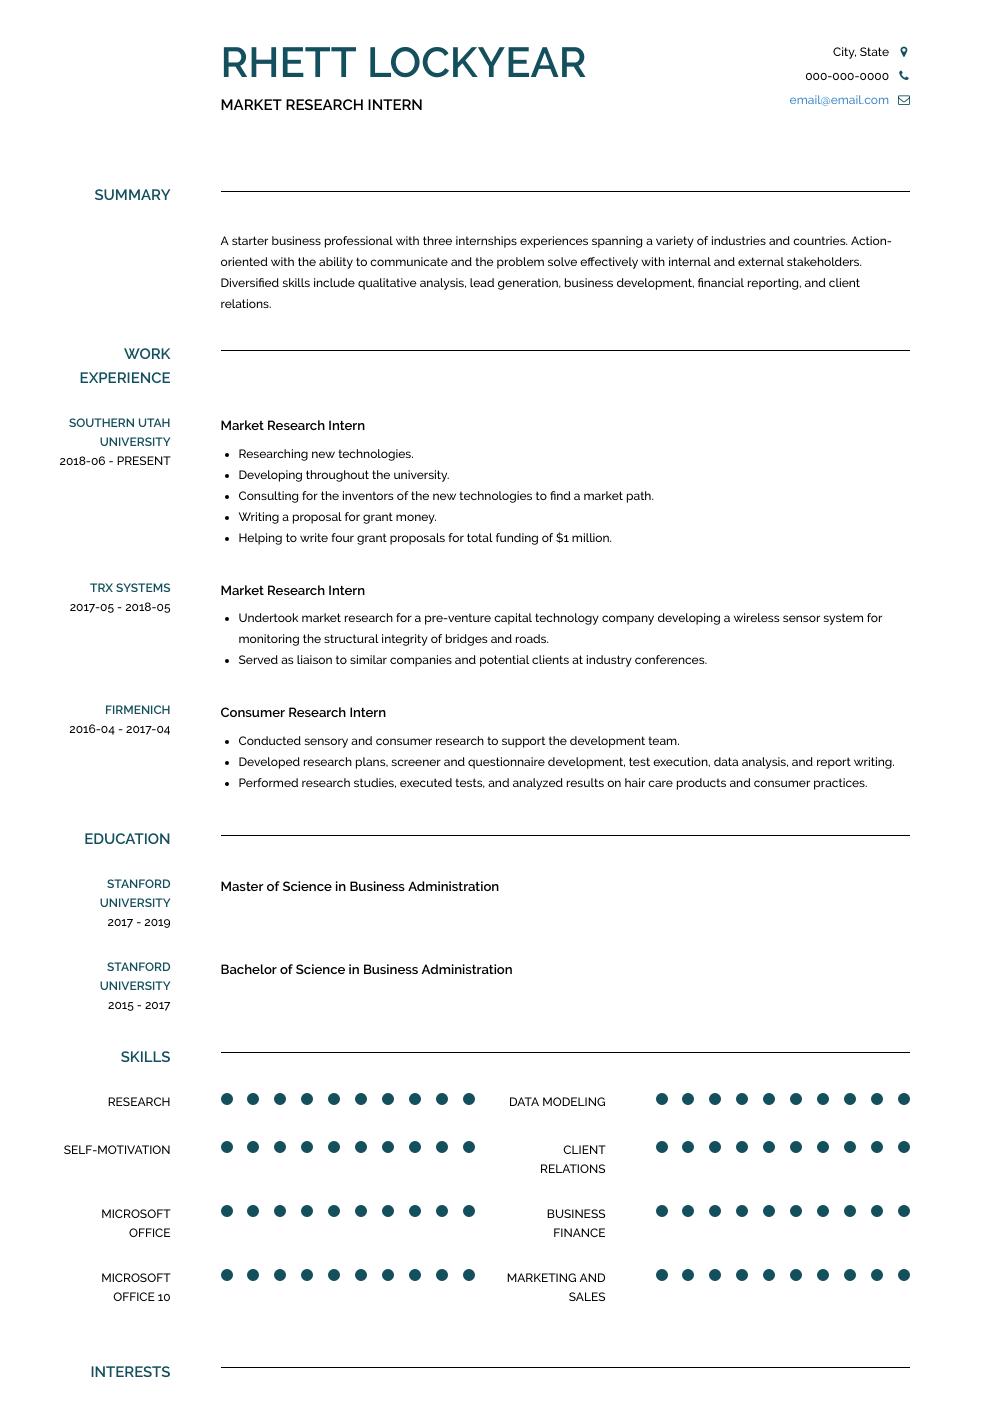 Research Intern - Resume Samples & Templates | VisualCV